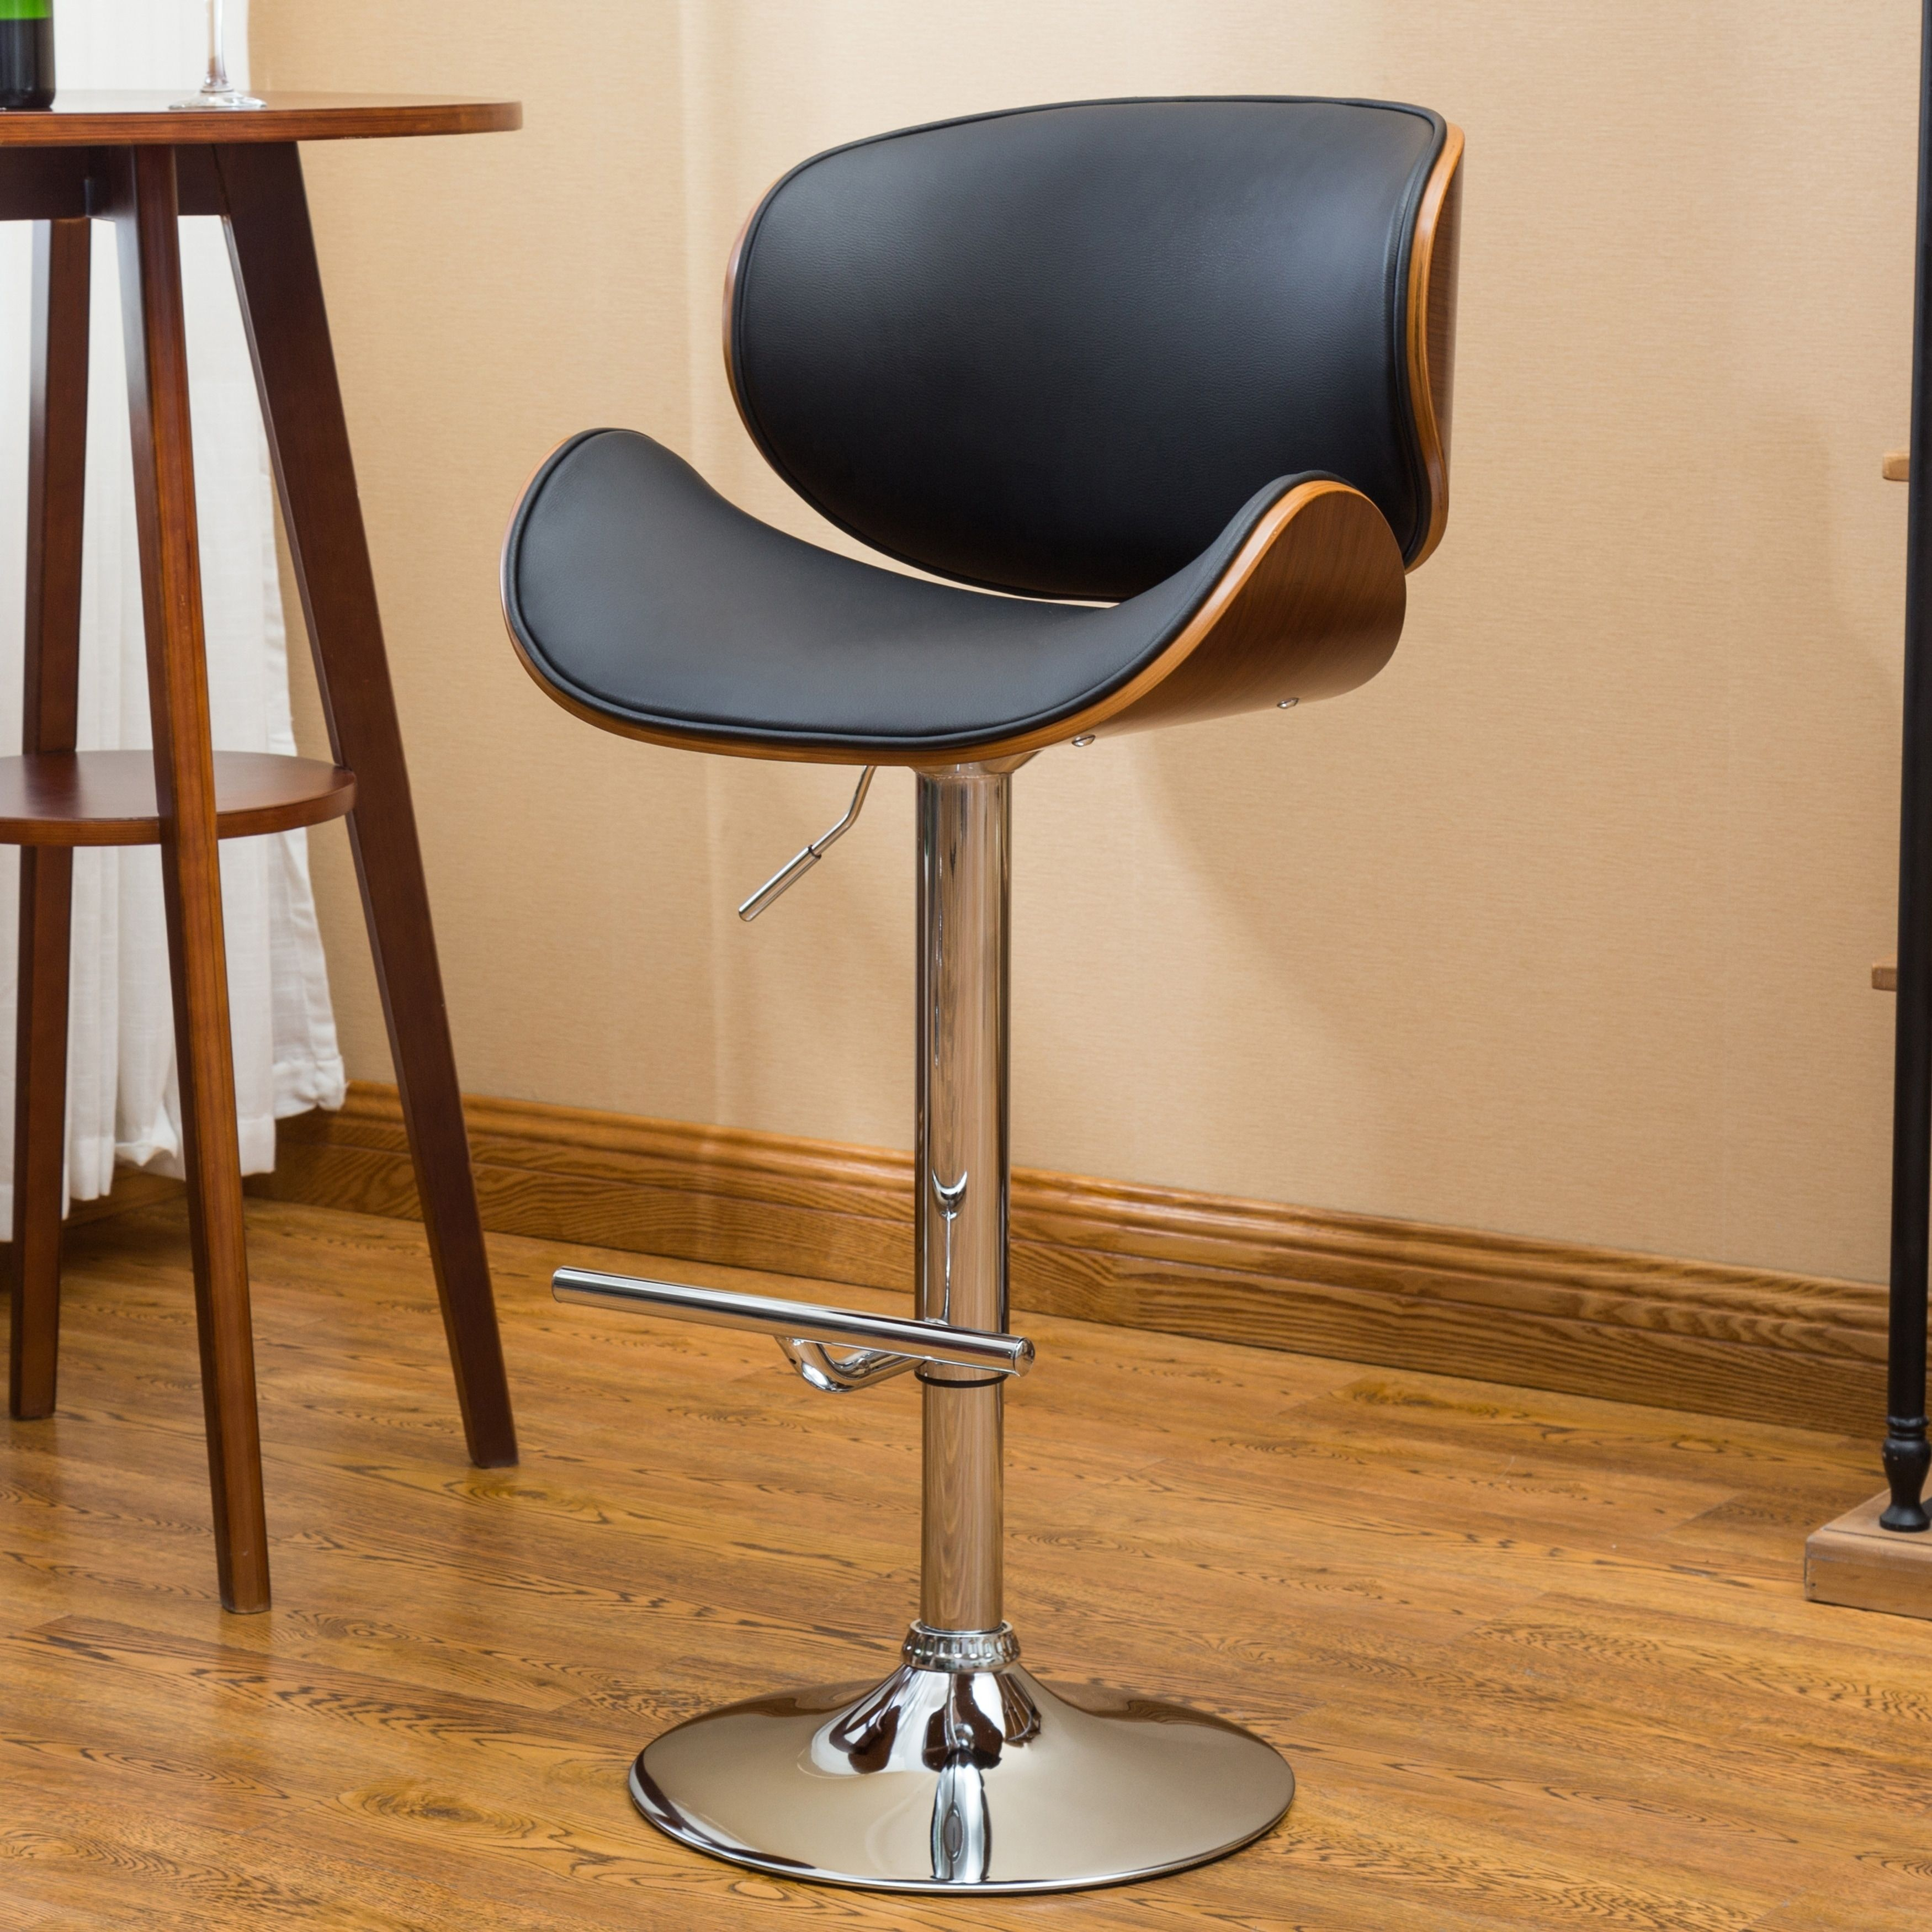 Peachy Carson Carrington Modern Adjustable Swivel Barstool Black Theyellowbook Wood Chair Design Ideas Theyellowbookinfo